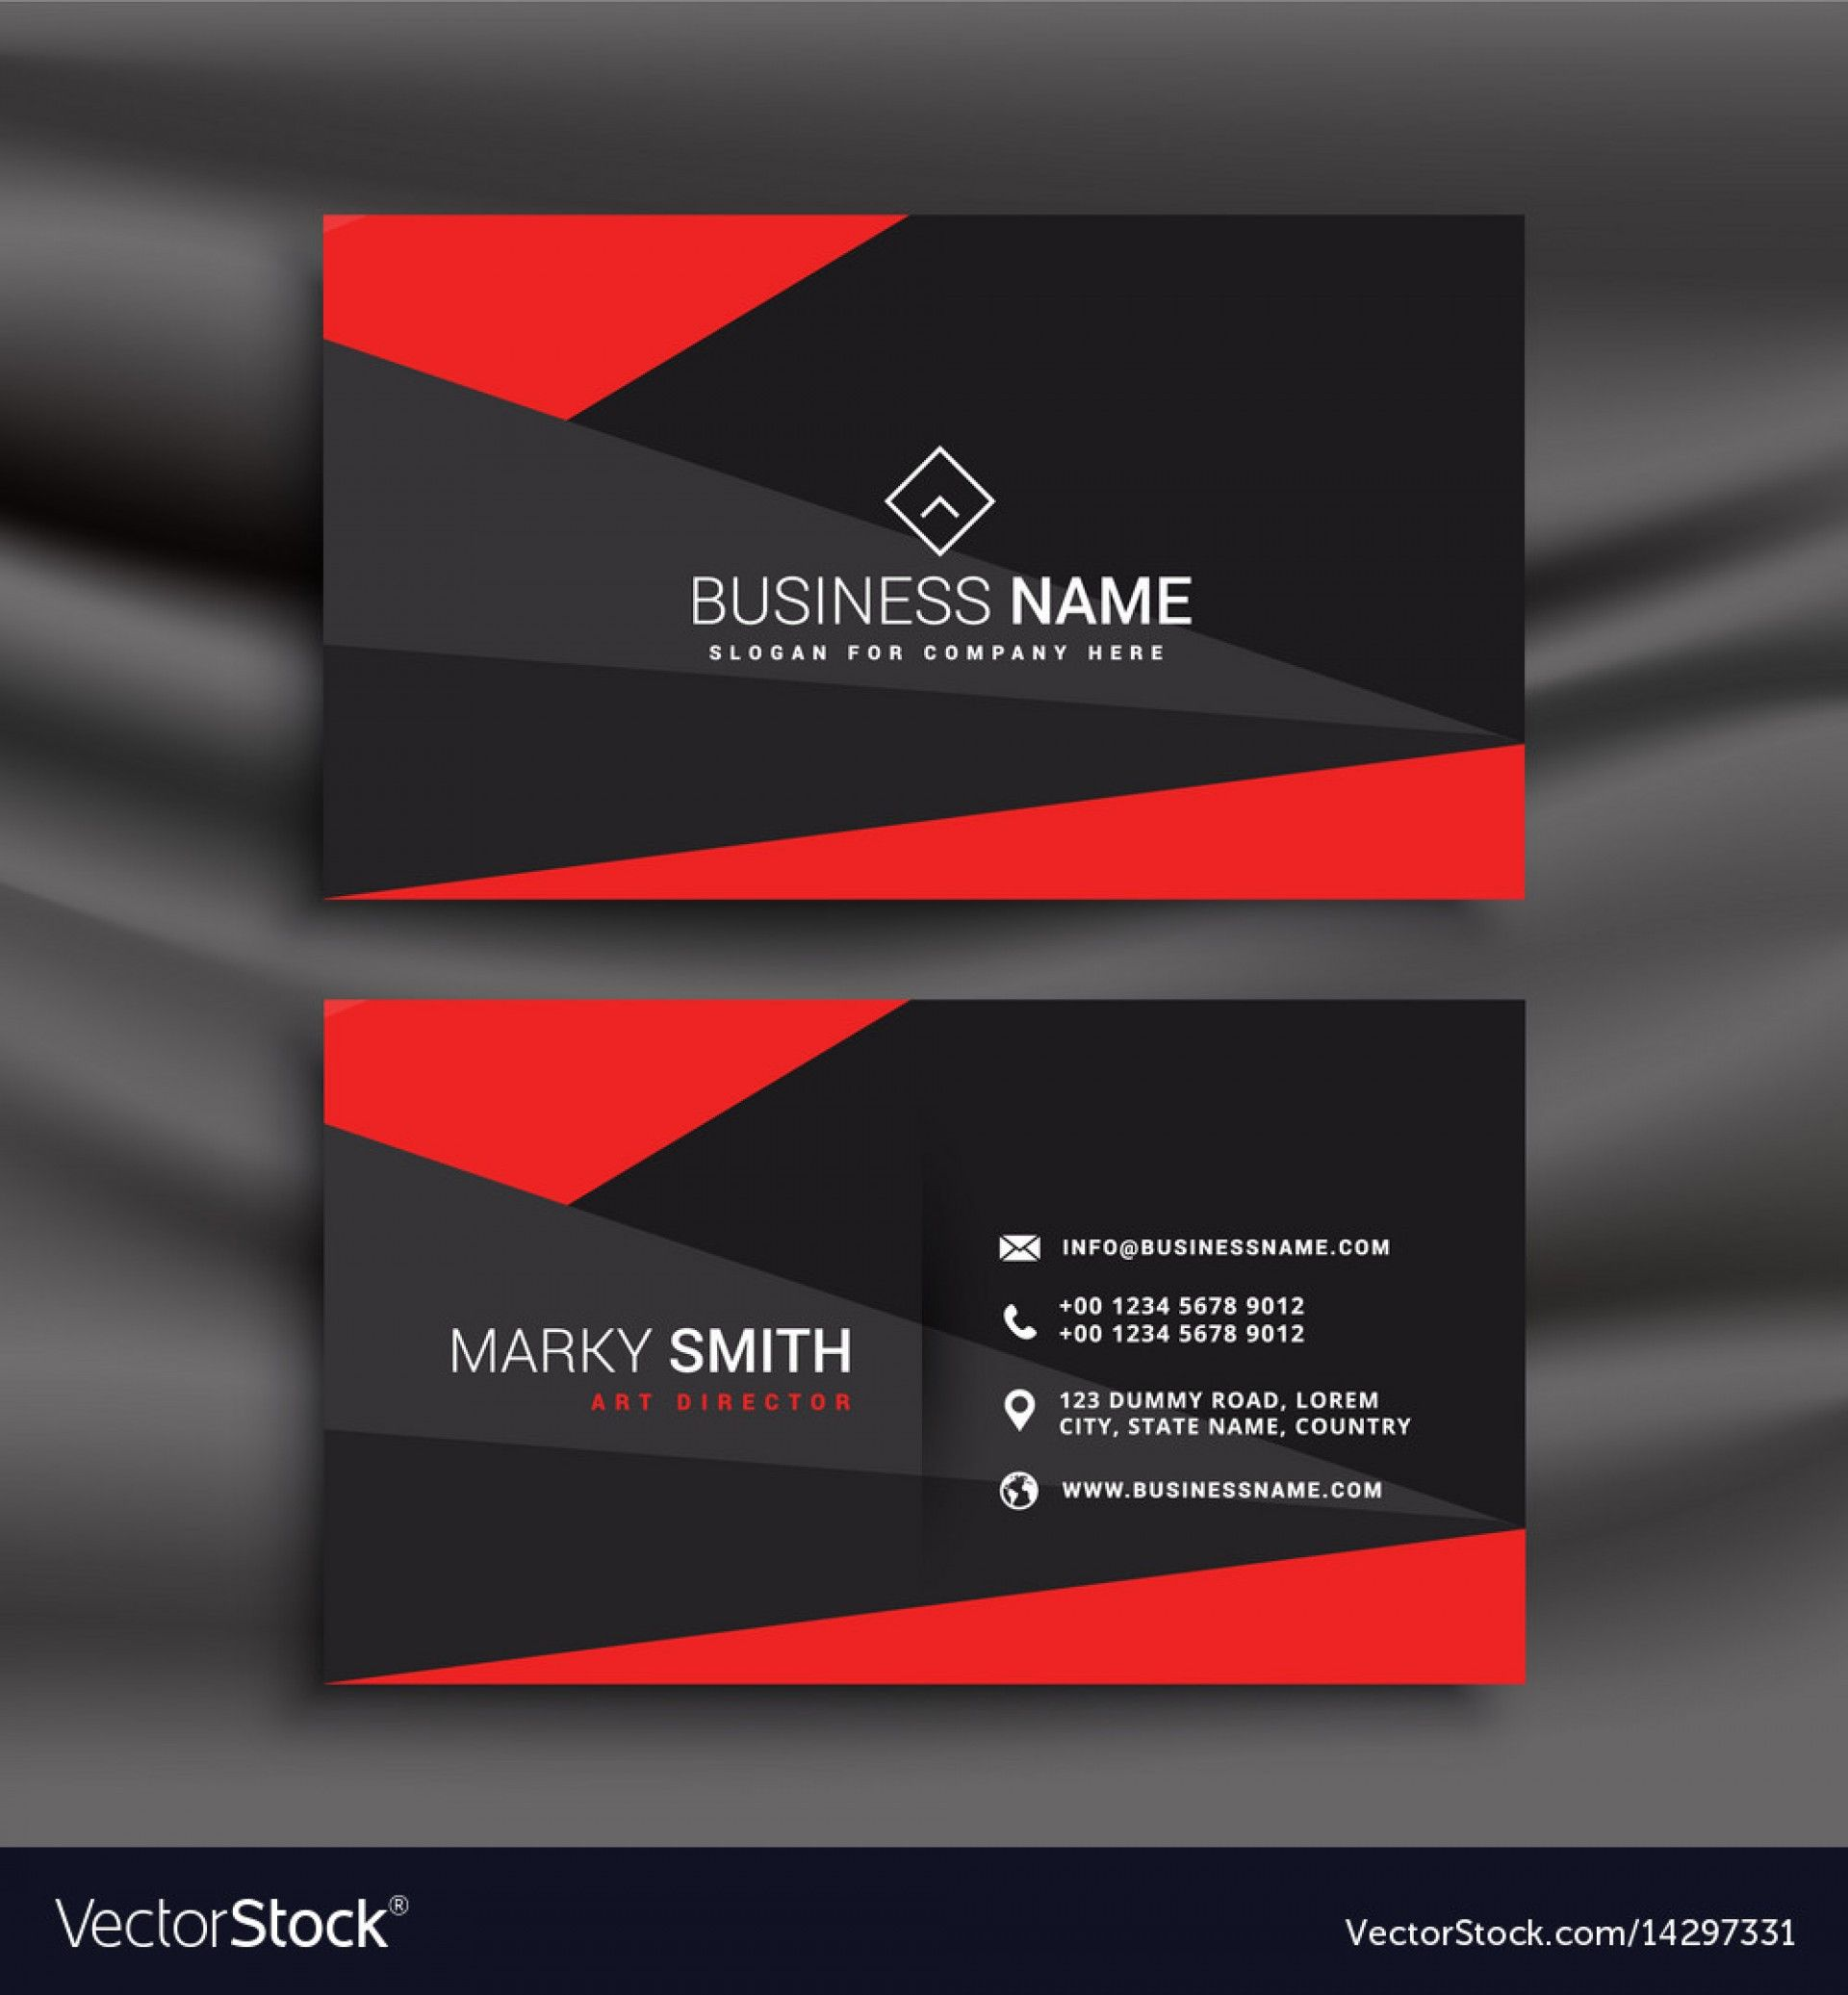 Avery Com Templates 8371 Business Cards Band Business Card Templates Free Beautiful 01 Red Business Cards Visiting Card Templates Free Printable Business Cards